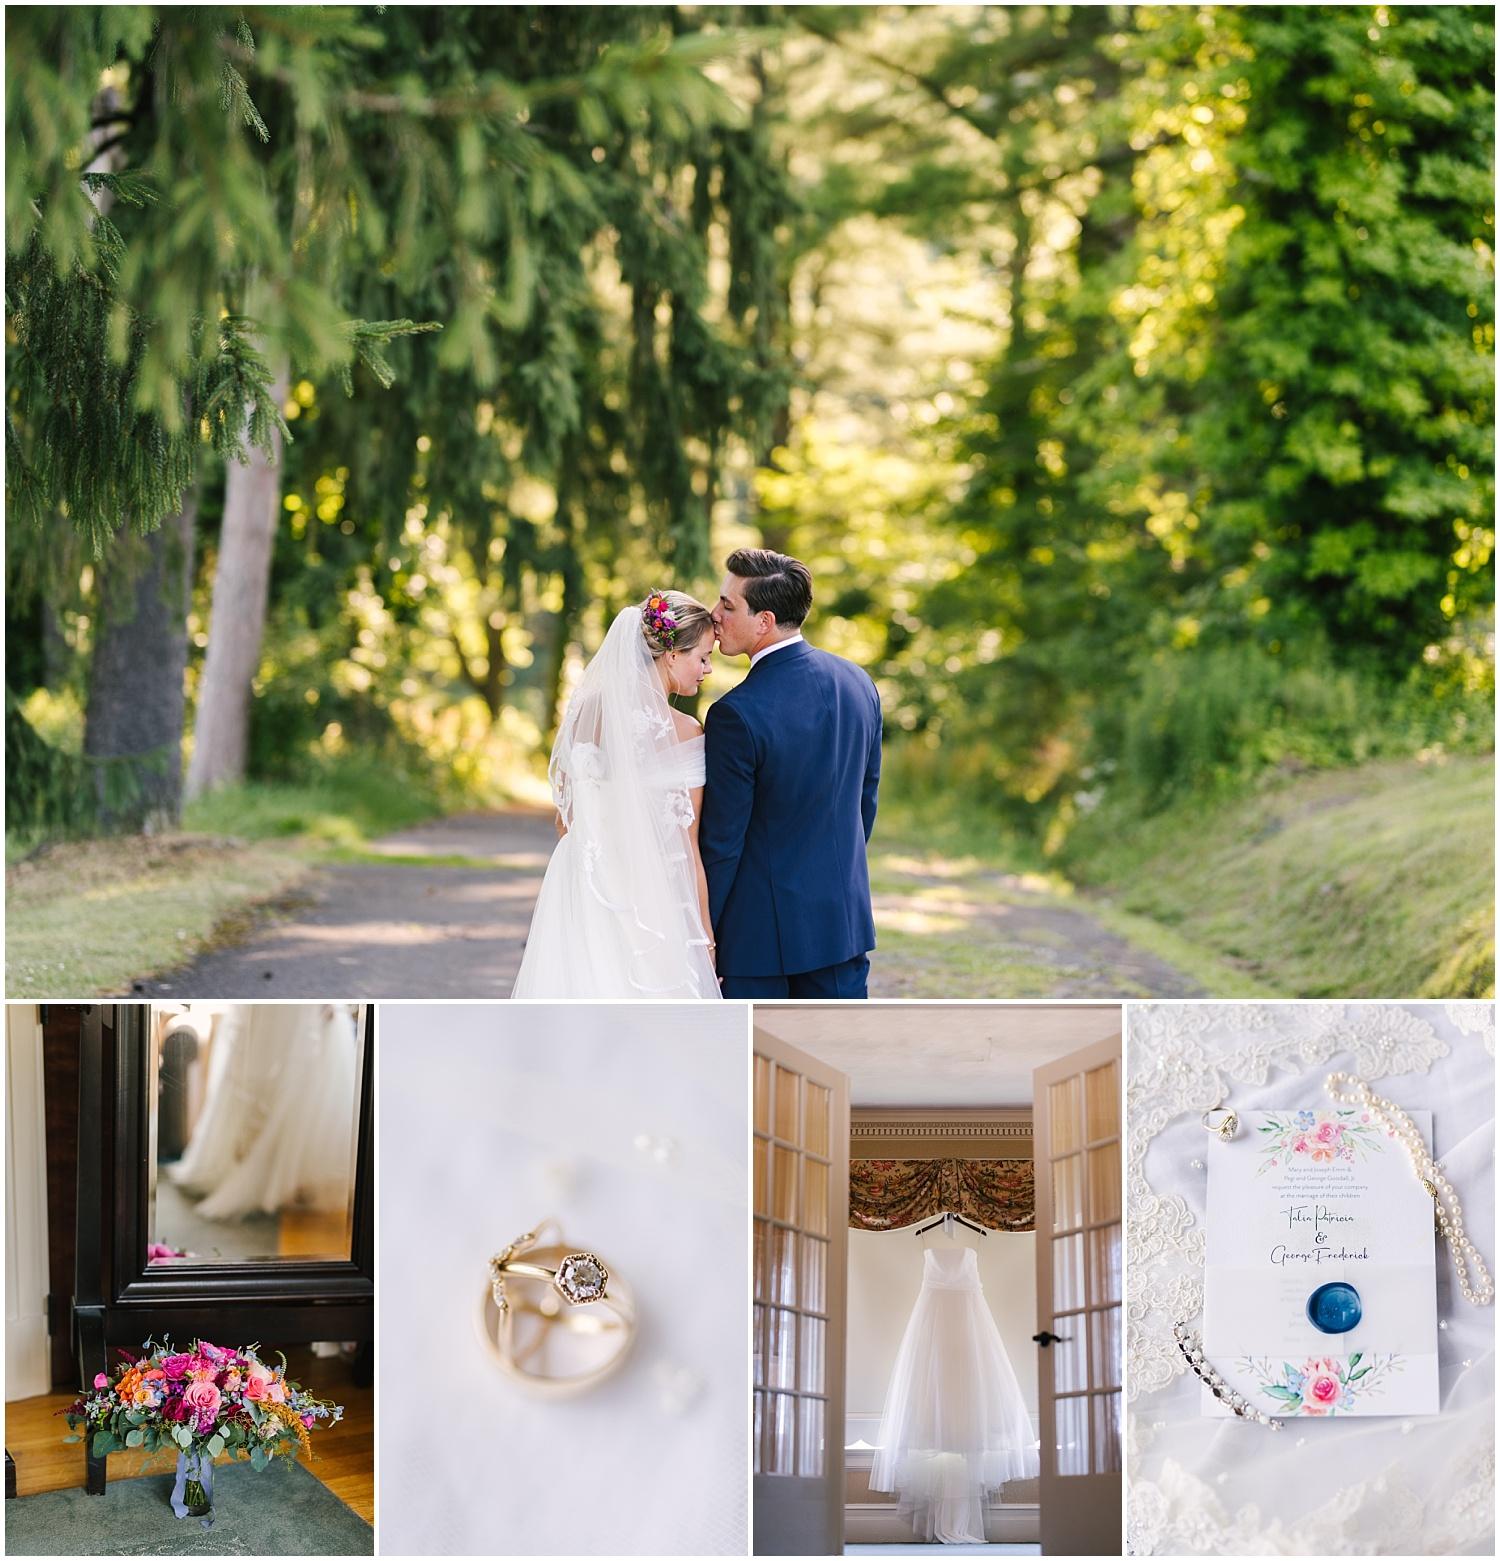 traditions+at+the+glen+wedding.jpg